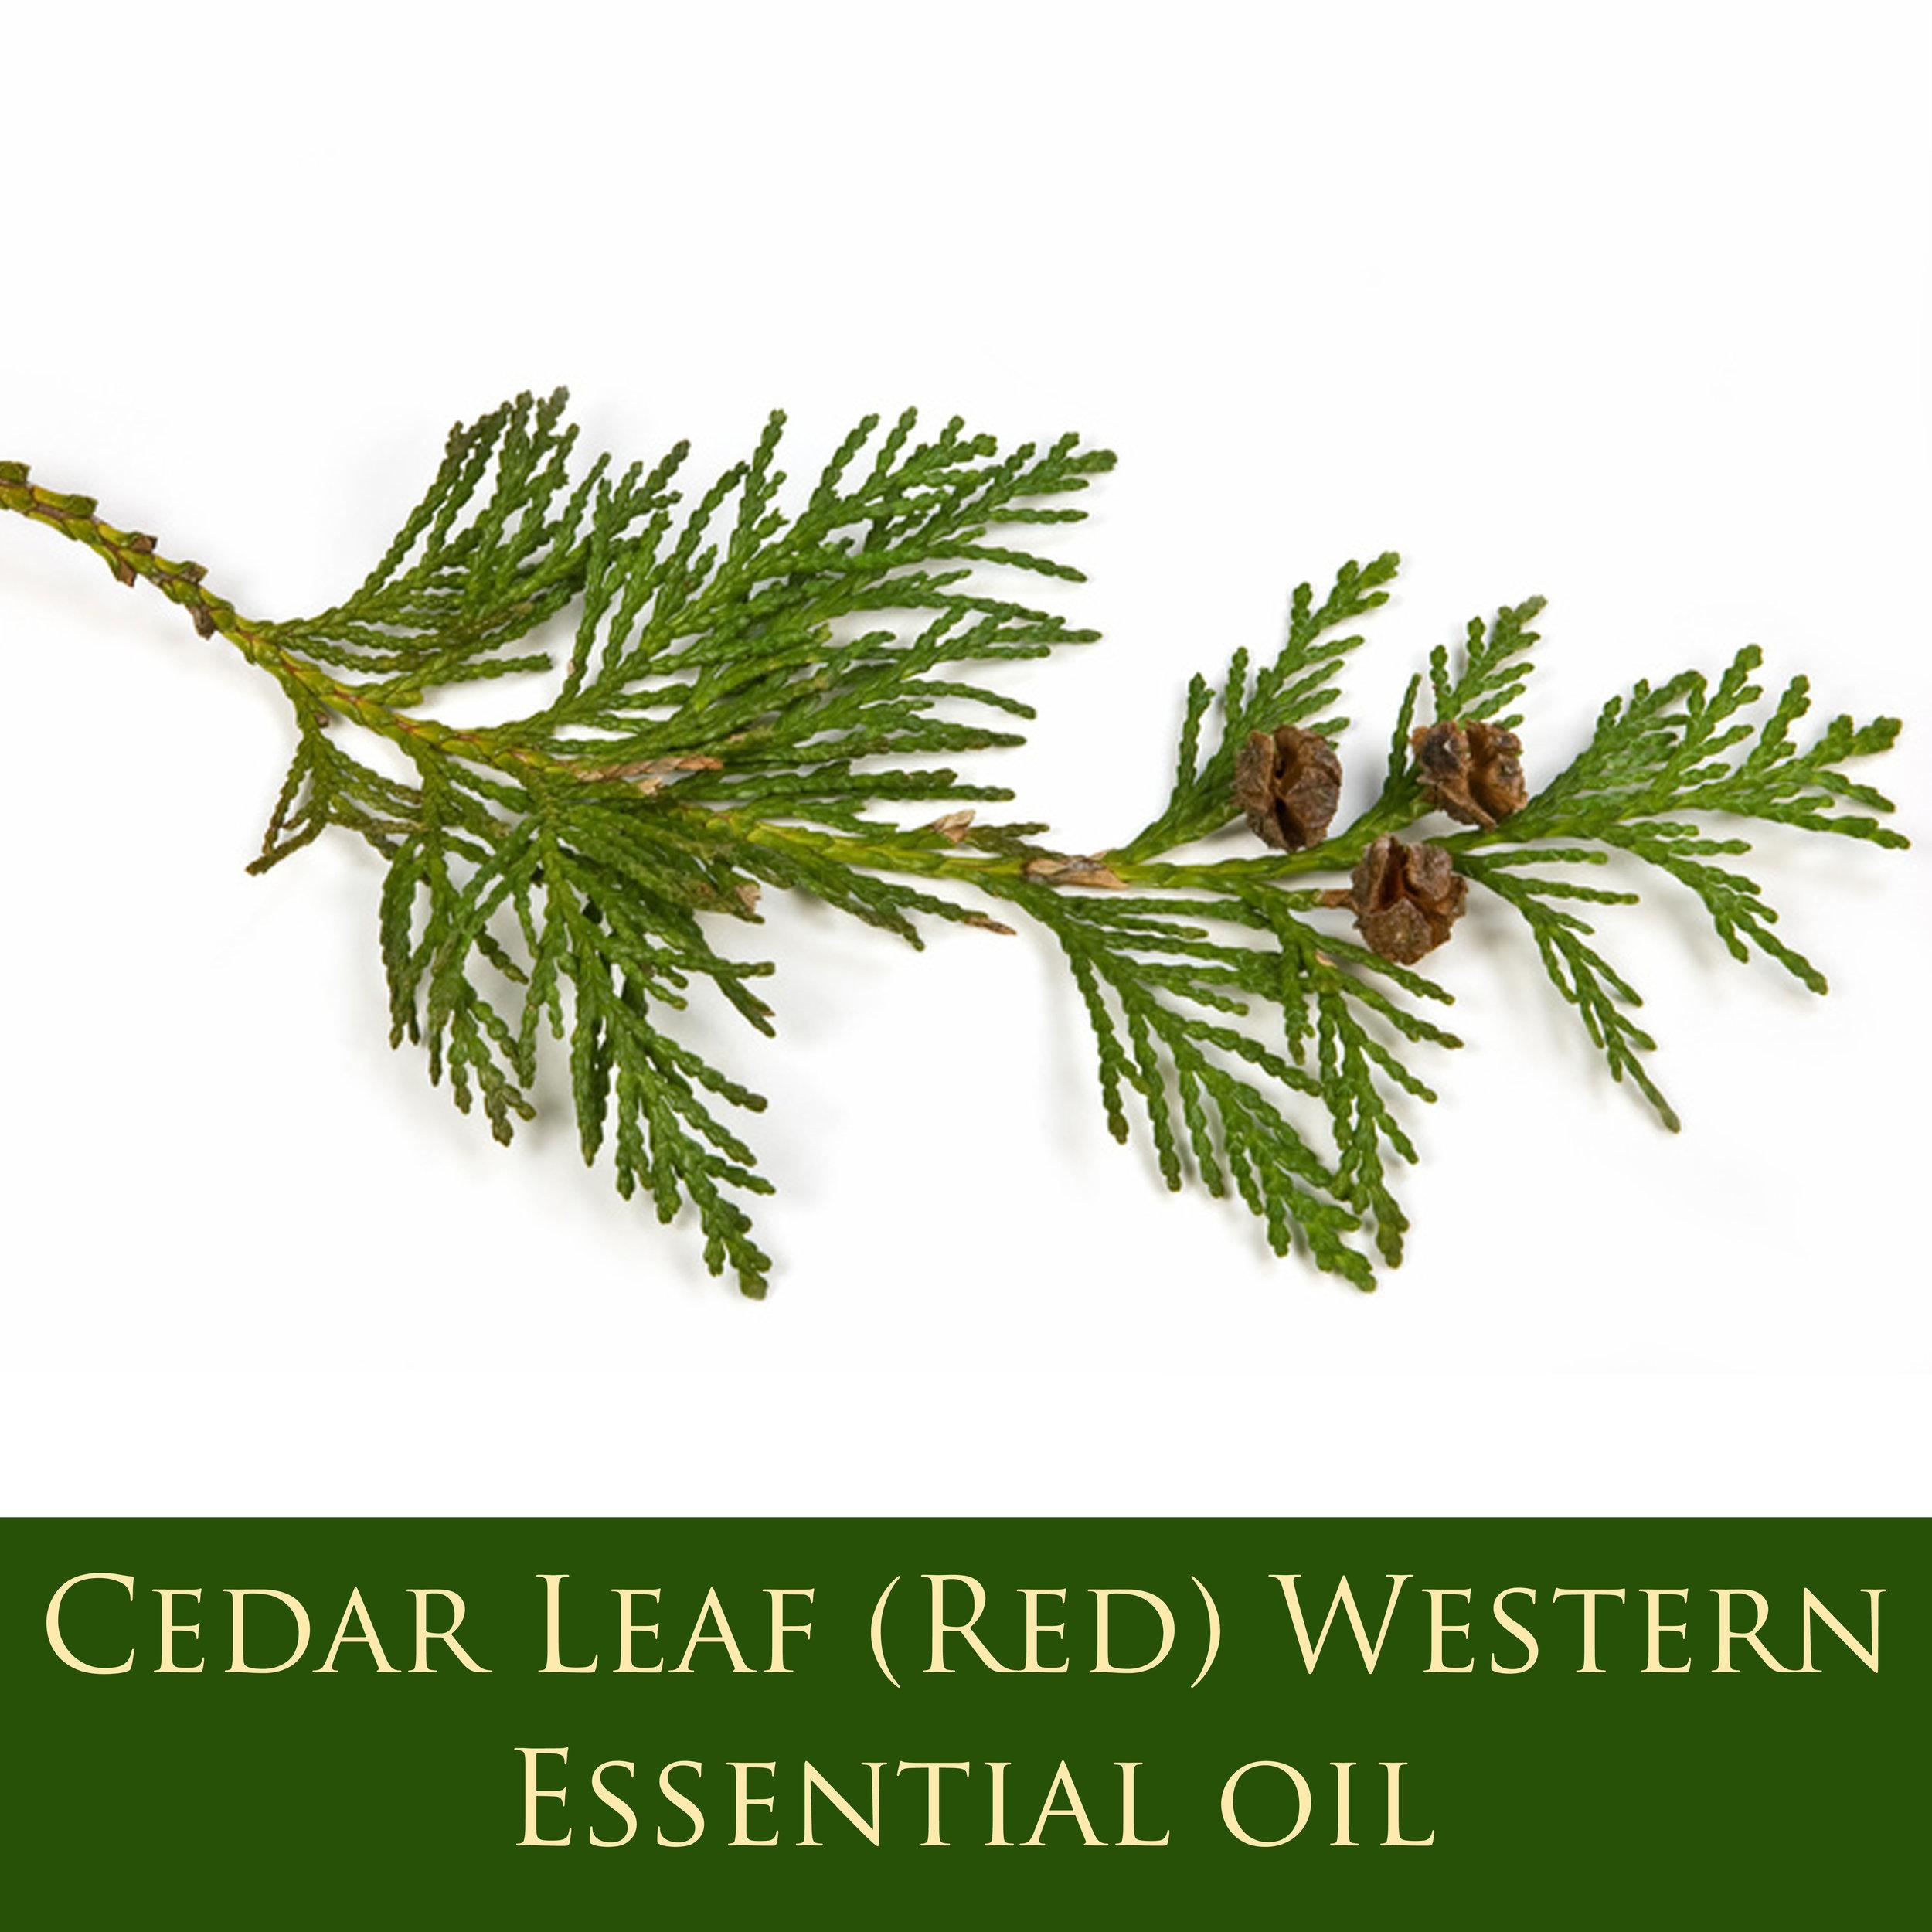 Red Cedar Leaf (Western) eo.jpg